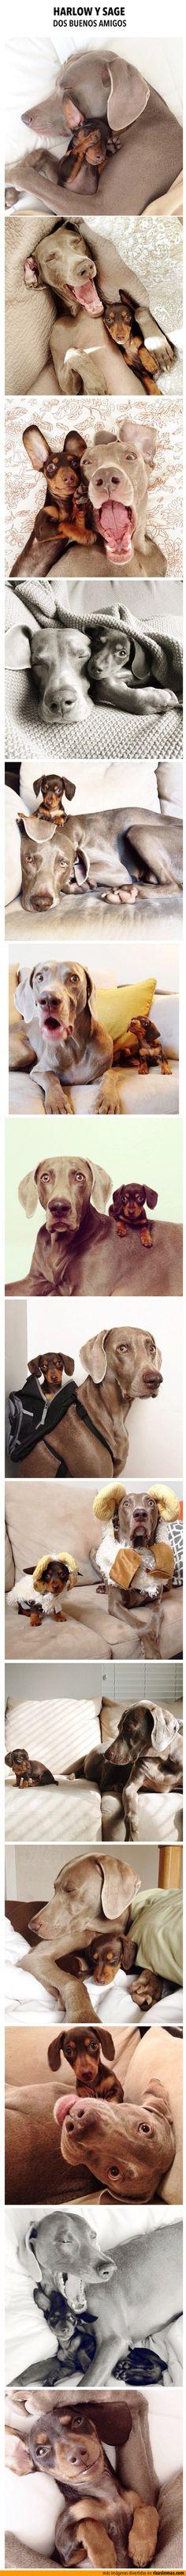 Best friends- a Dachshund and a Weimaraner